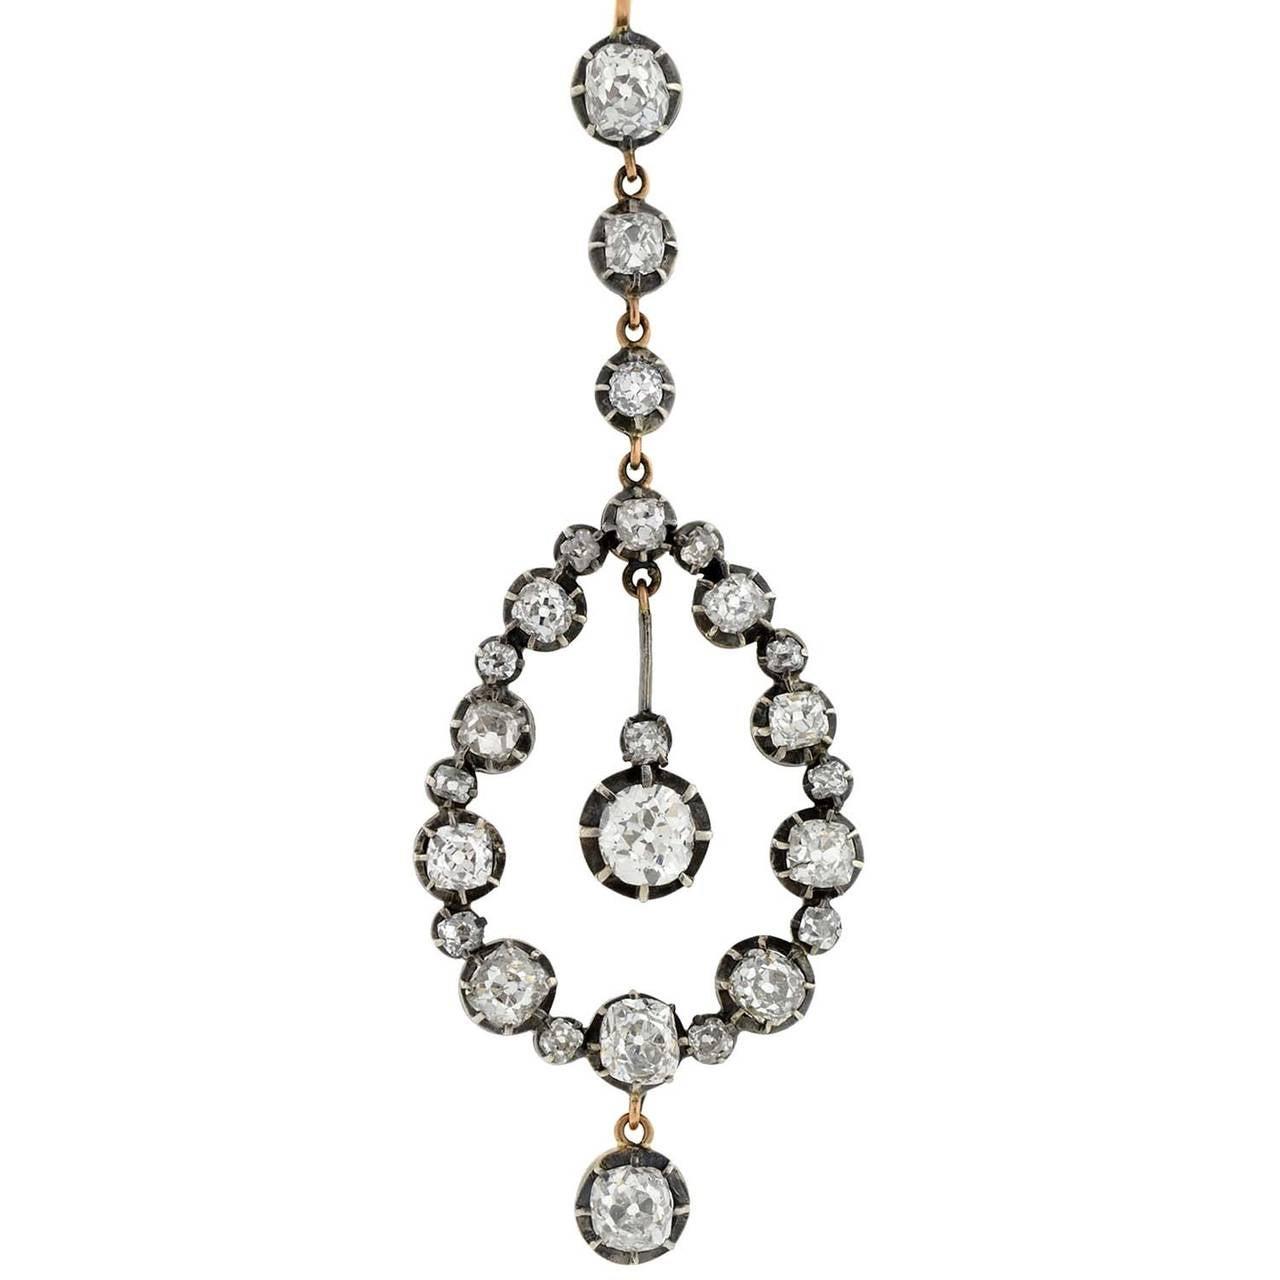 Victorian Dramatic Diamond Teardrop Earrings 726ctw 2